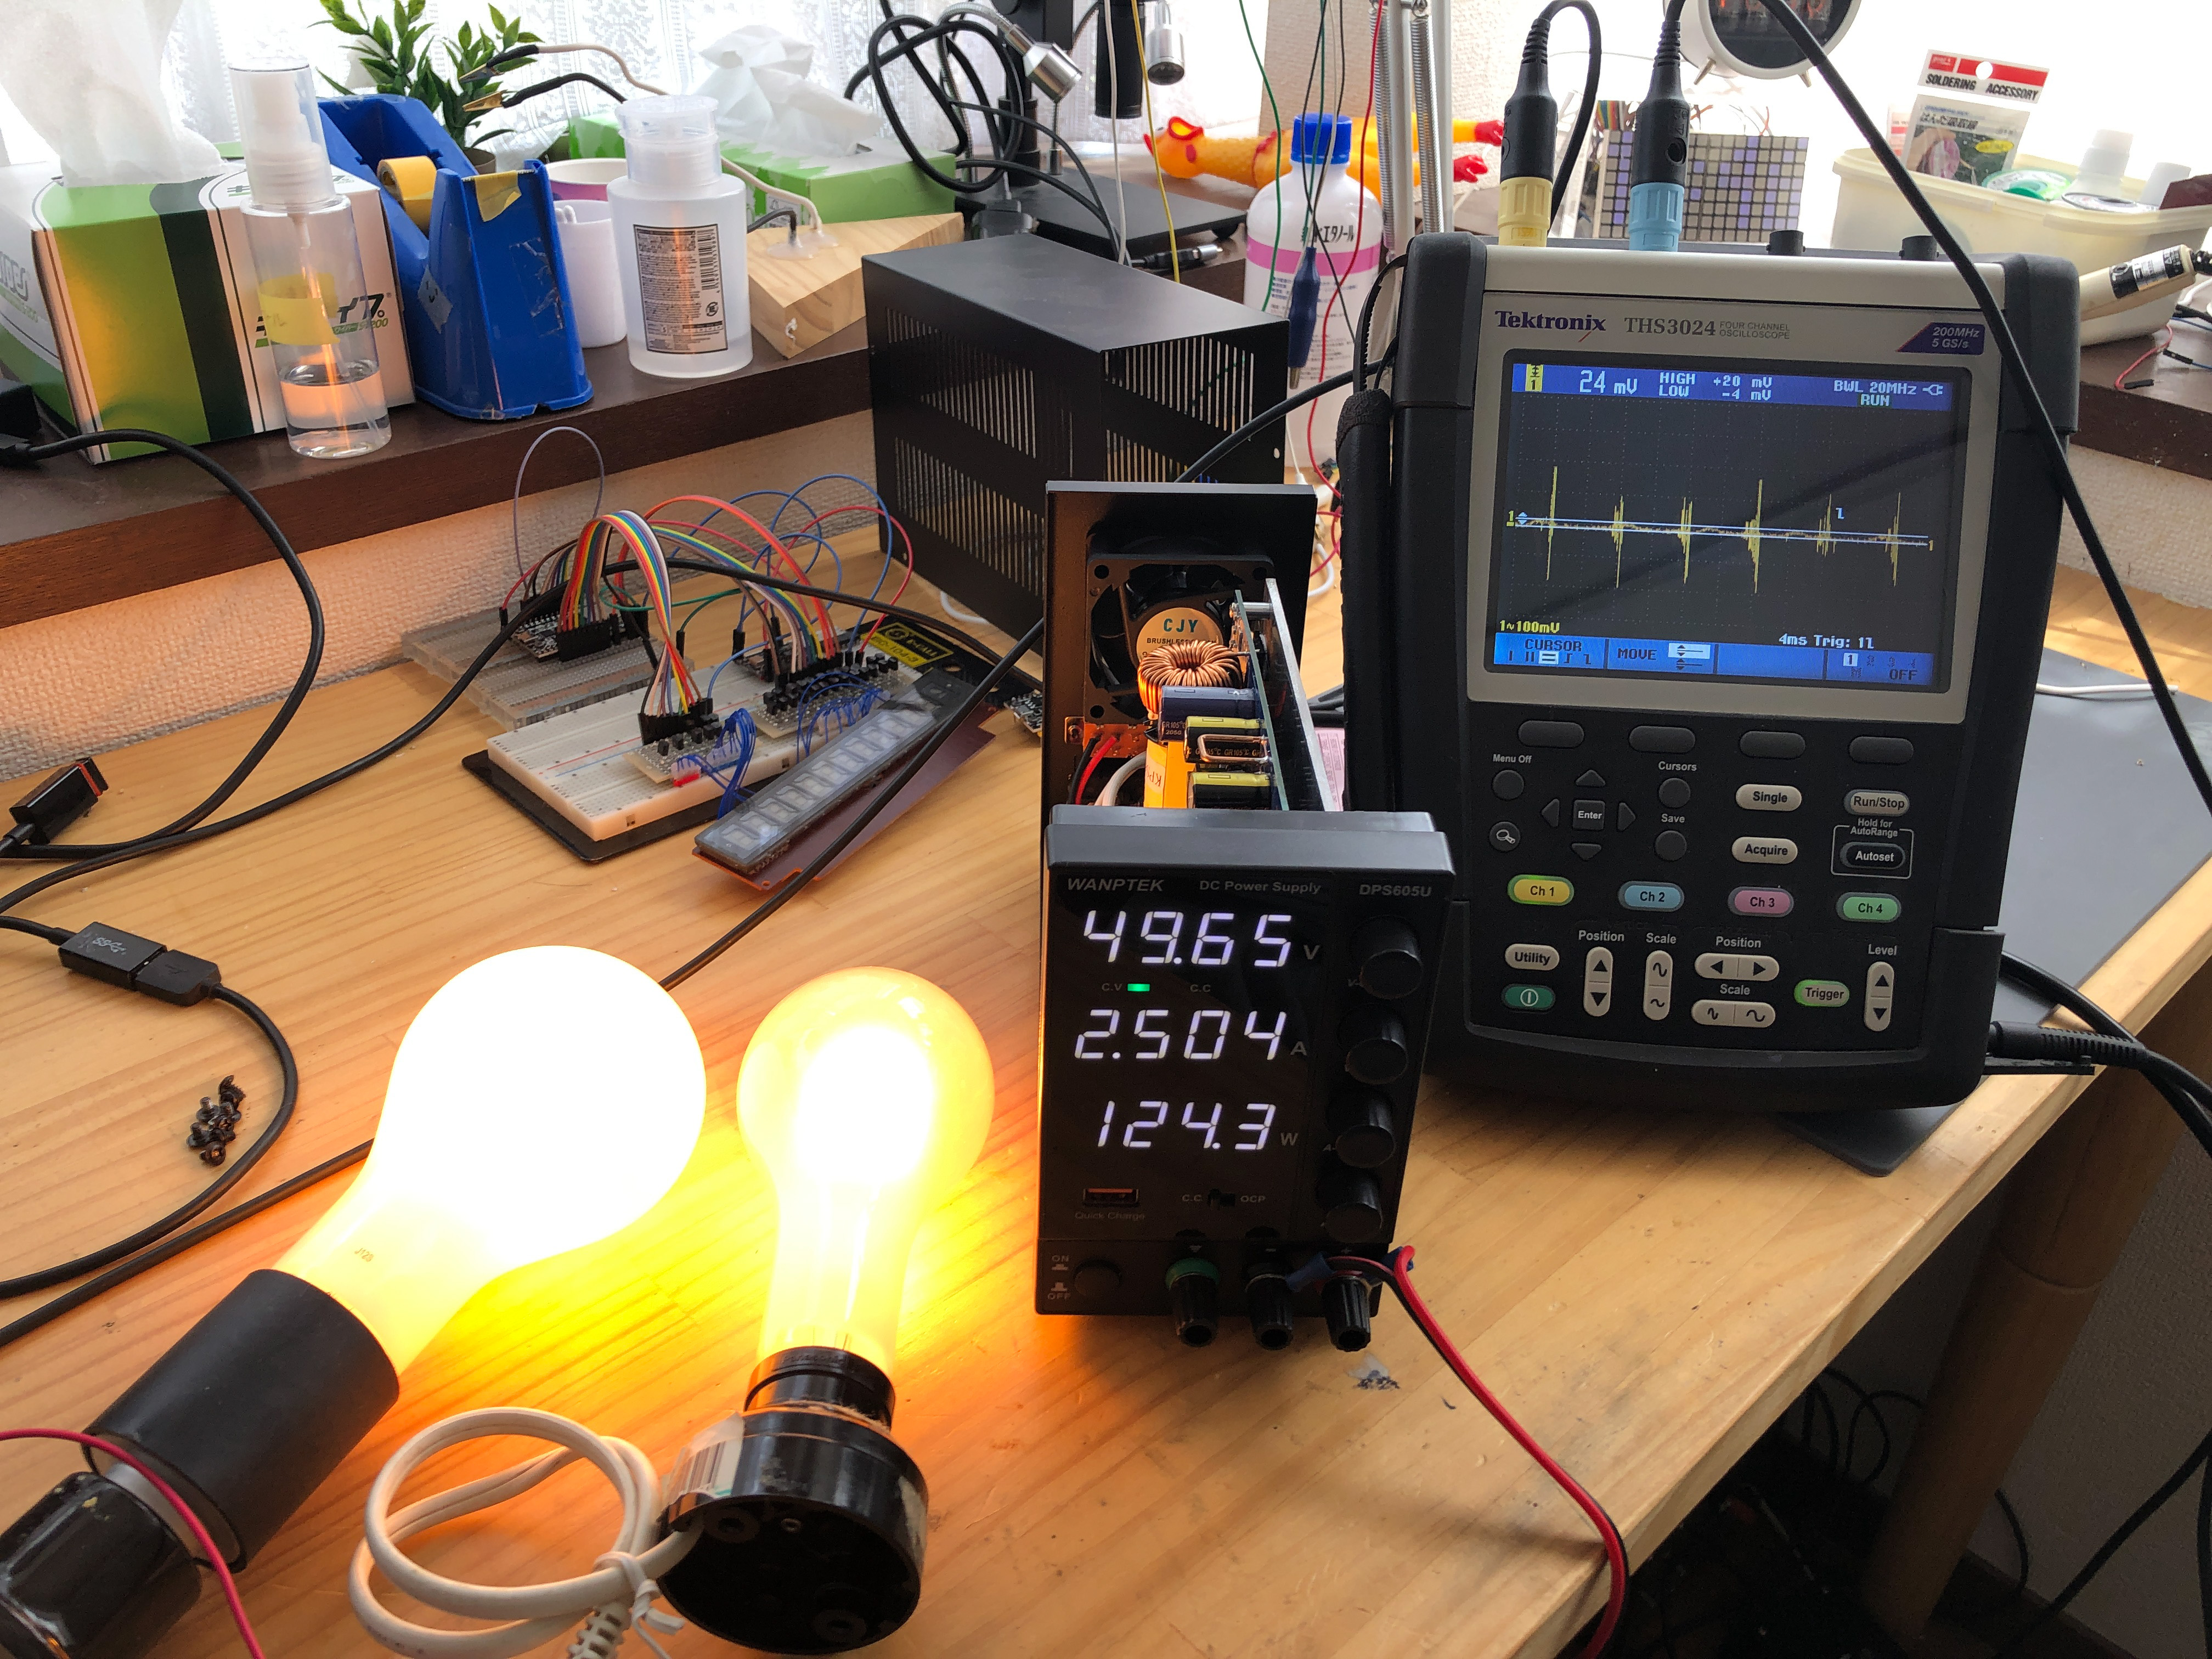 DPS605Uの負荷実験